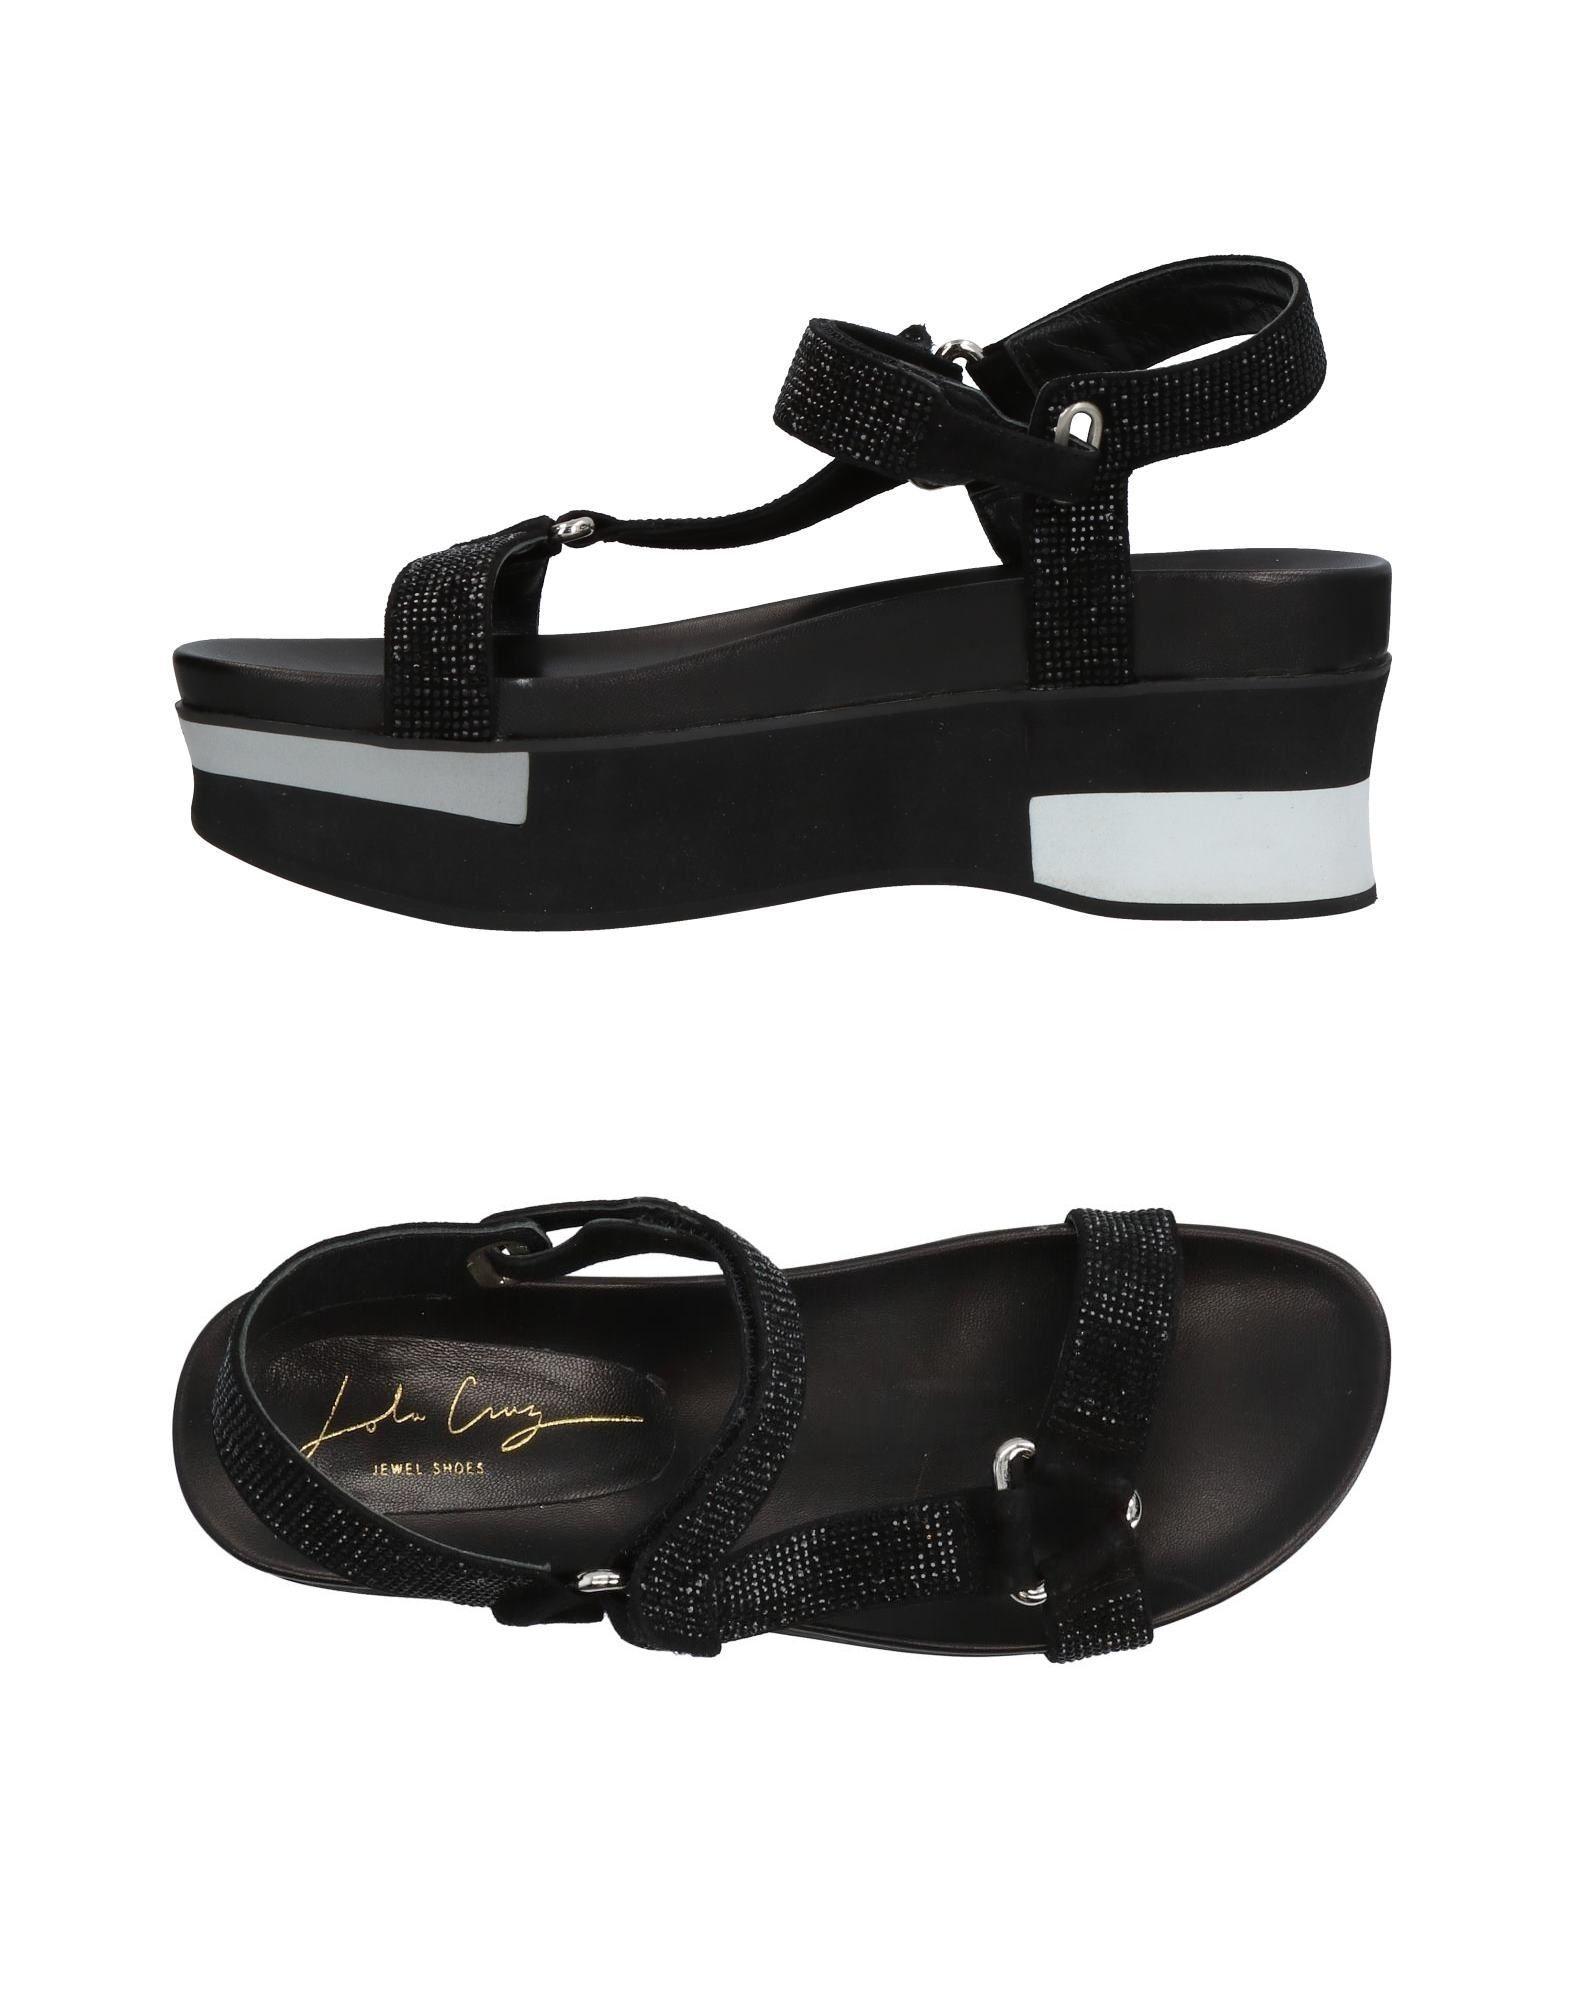 Lola 11345974QW Cruz Sandalen Damen  11345974QW Lola Gute Qualität beliebte Schuhe d2267c